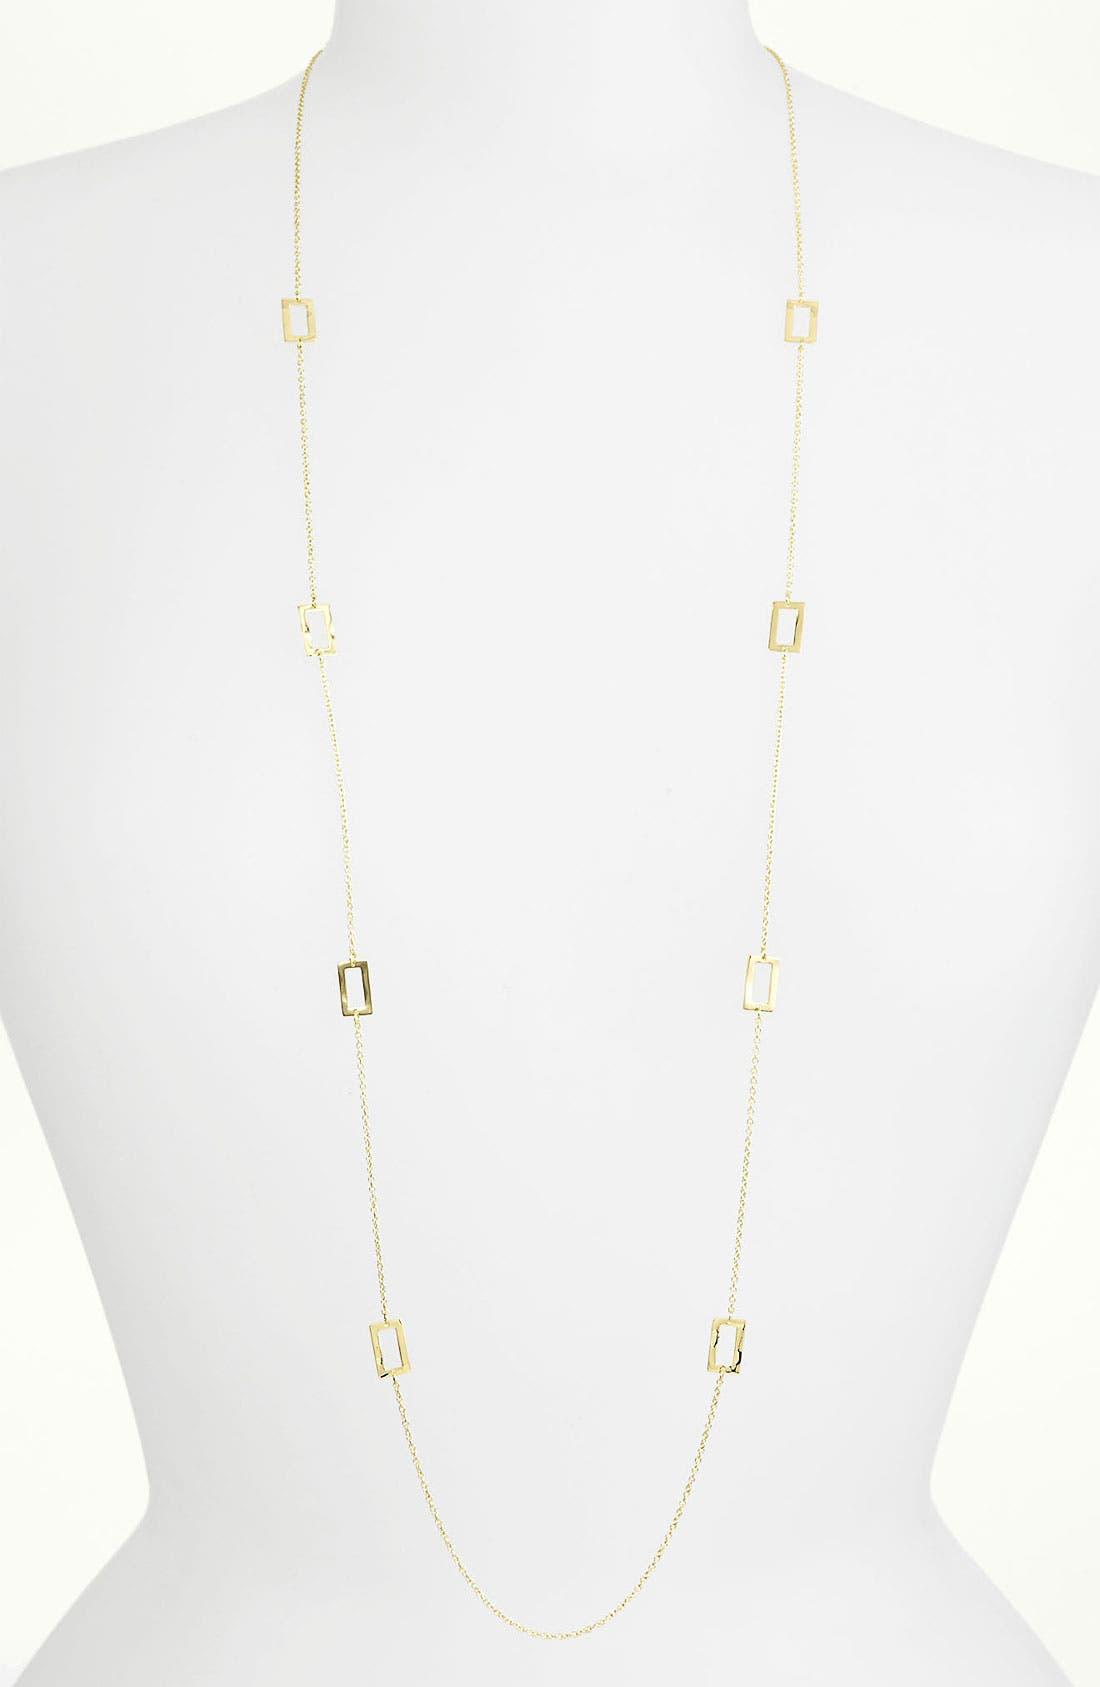 Alternate Image 1 Selected - Ippolita 'Plain' Long Rectangle Station 18k Gold Necklace